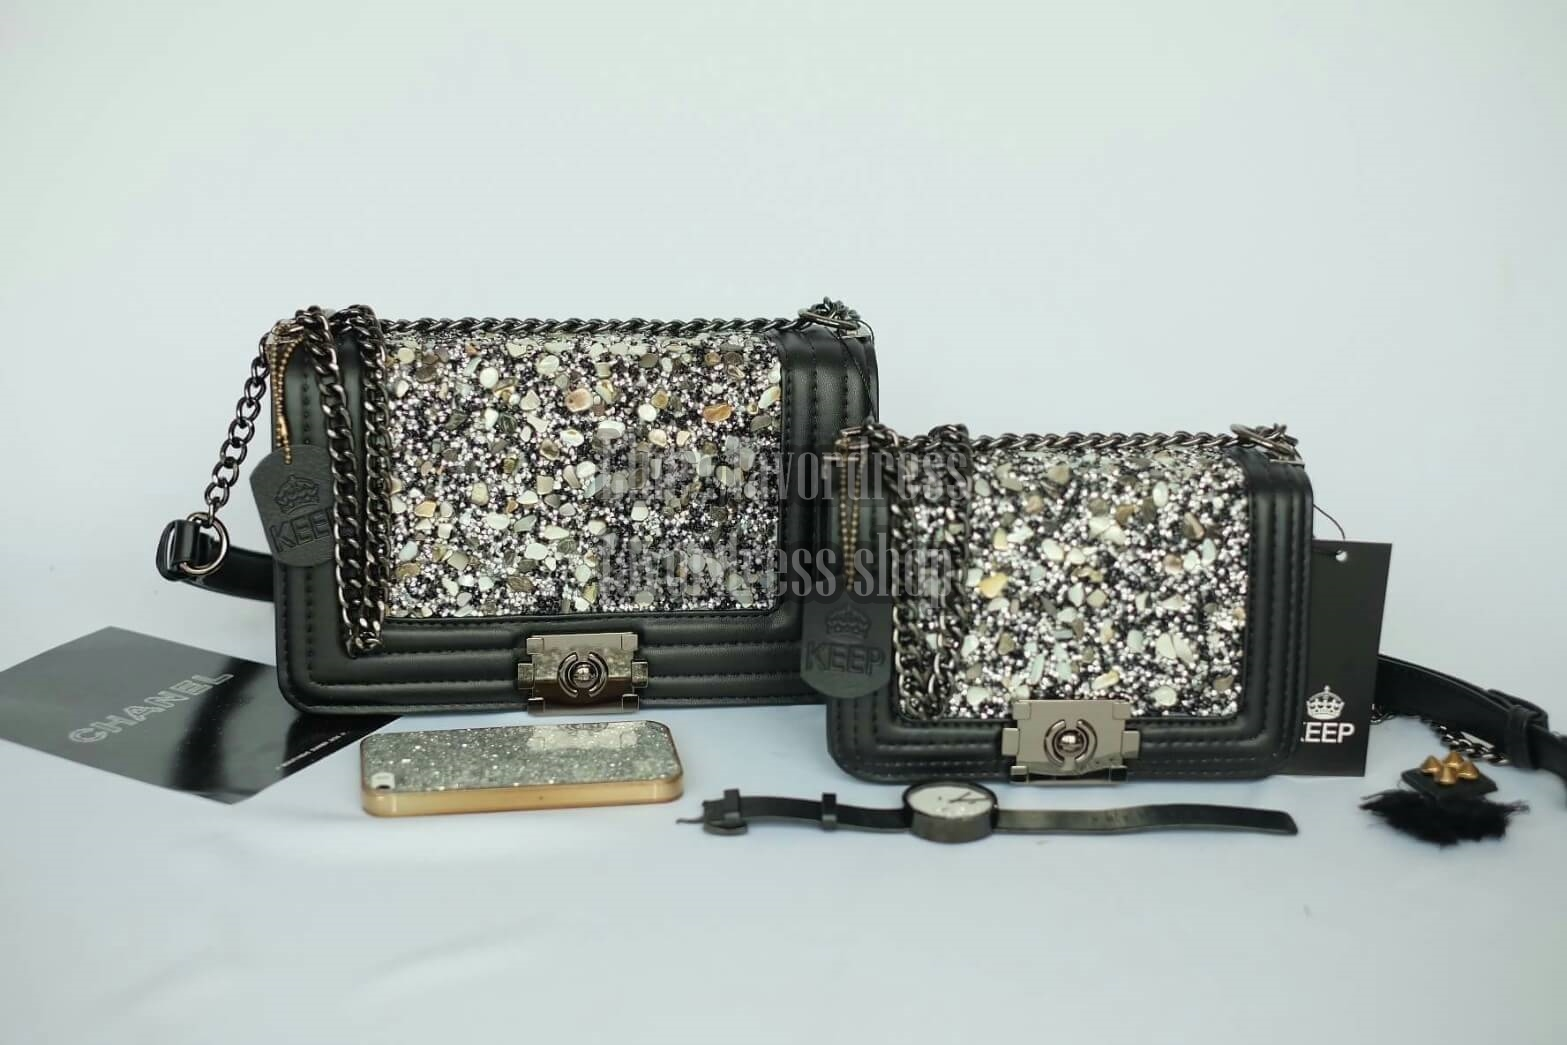 KEEP ทรง Chanel สุดหรู รุ่น KEEP shoulder diamond chain bag